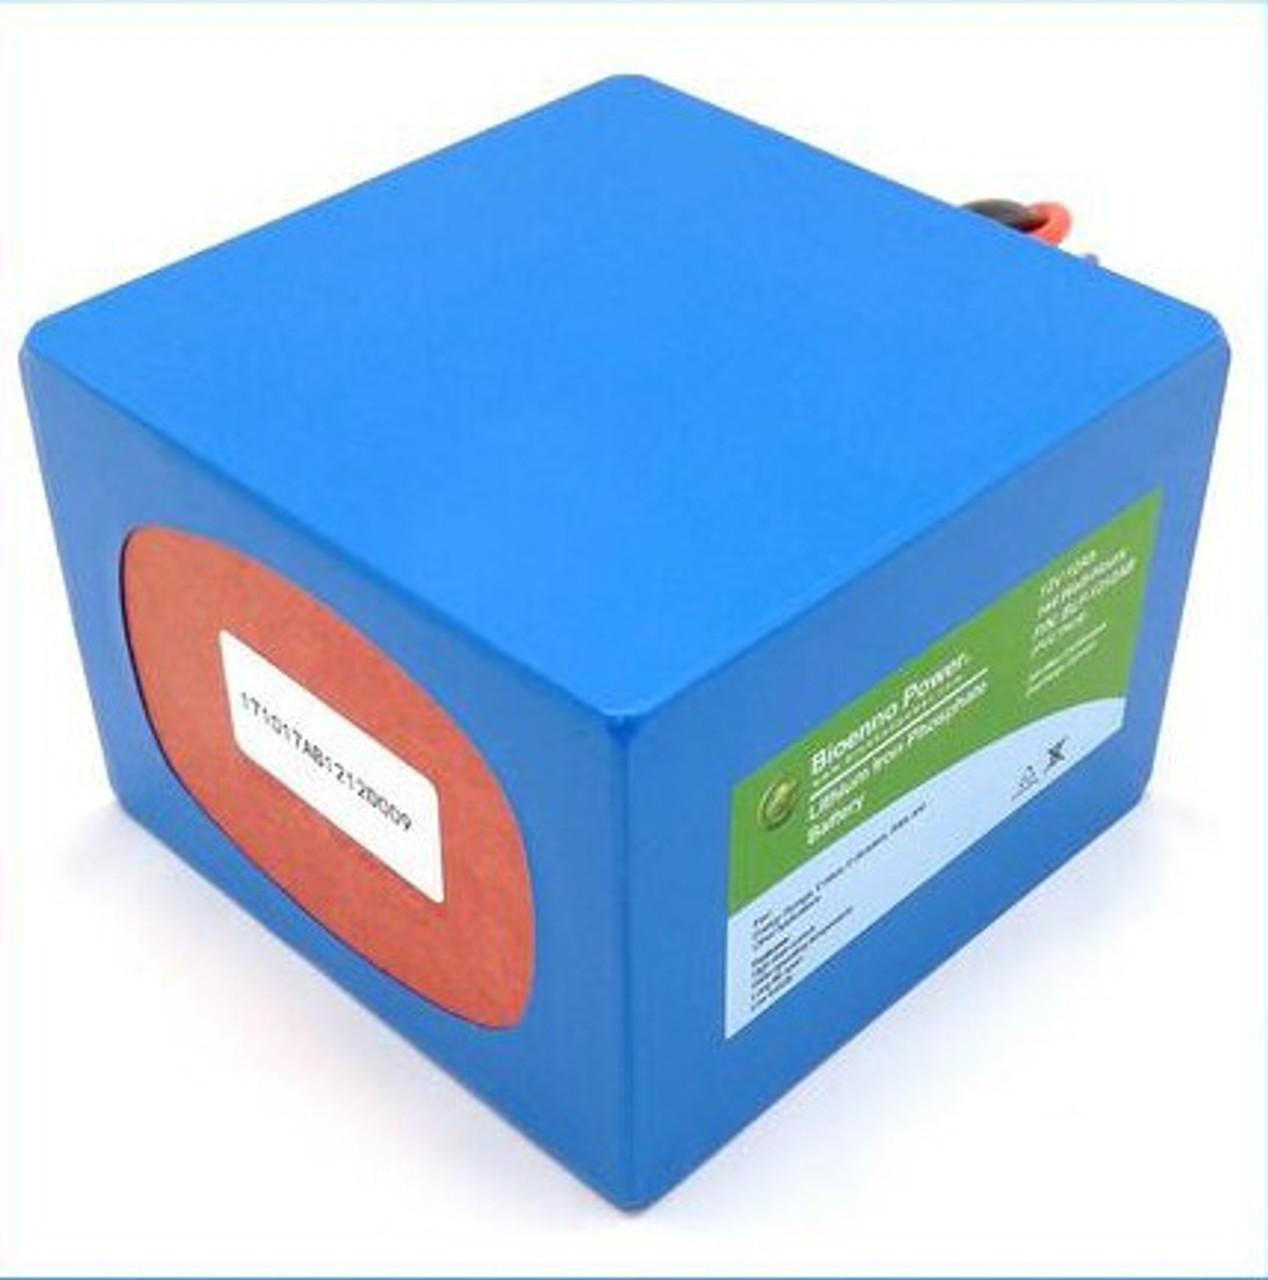 Bioenno Power 12 Volt, 12 Amp Hour Lithium Iron Phosphate Battery (AB)